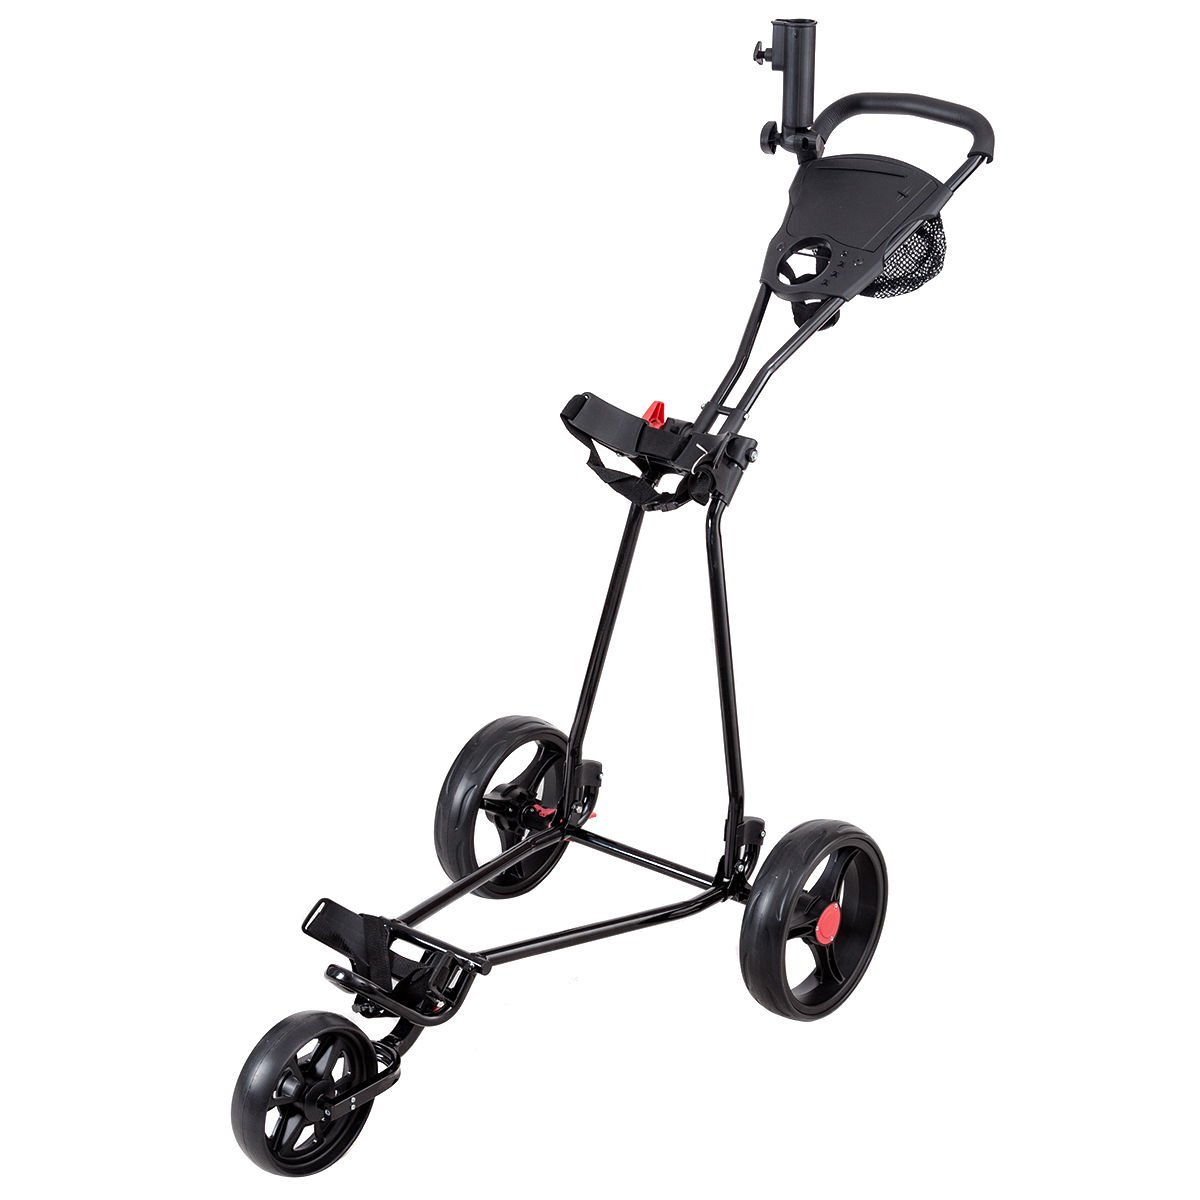 Tangkula Golf Cart 3 Wheels Folding Lightweight Golf Club Push Pull Cart Trolley